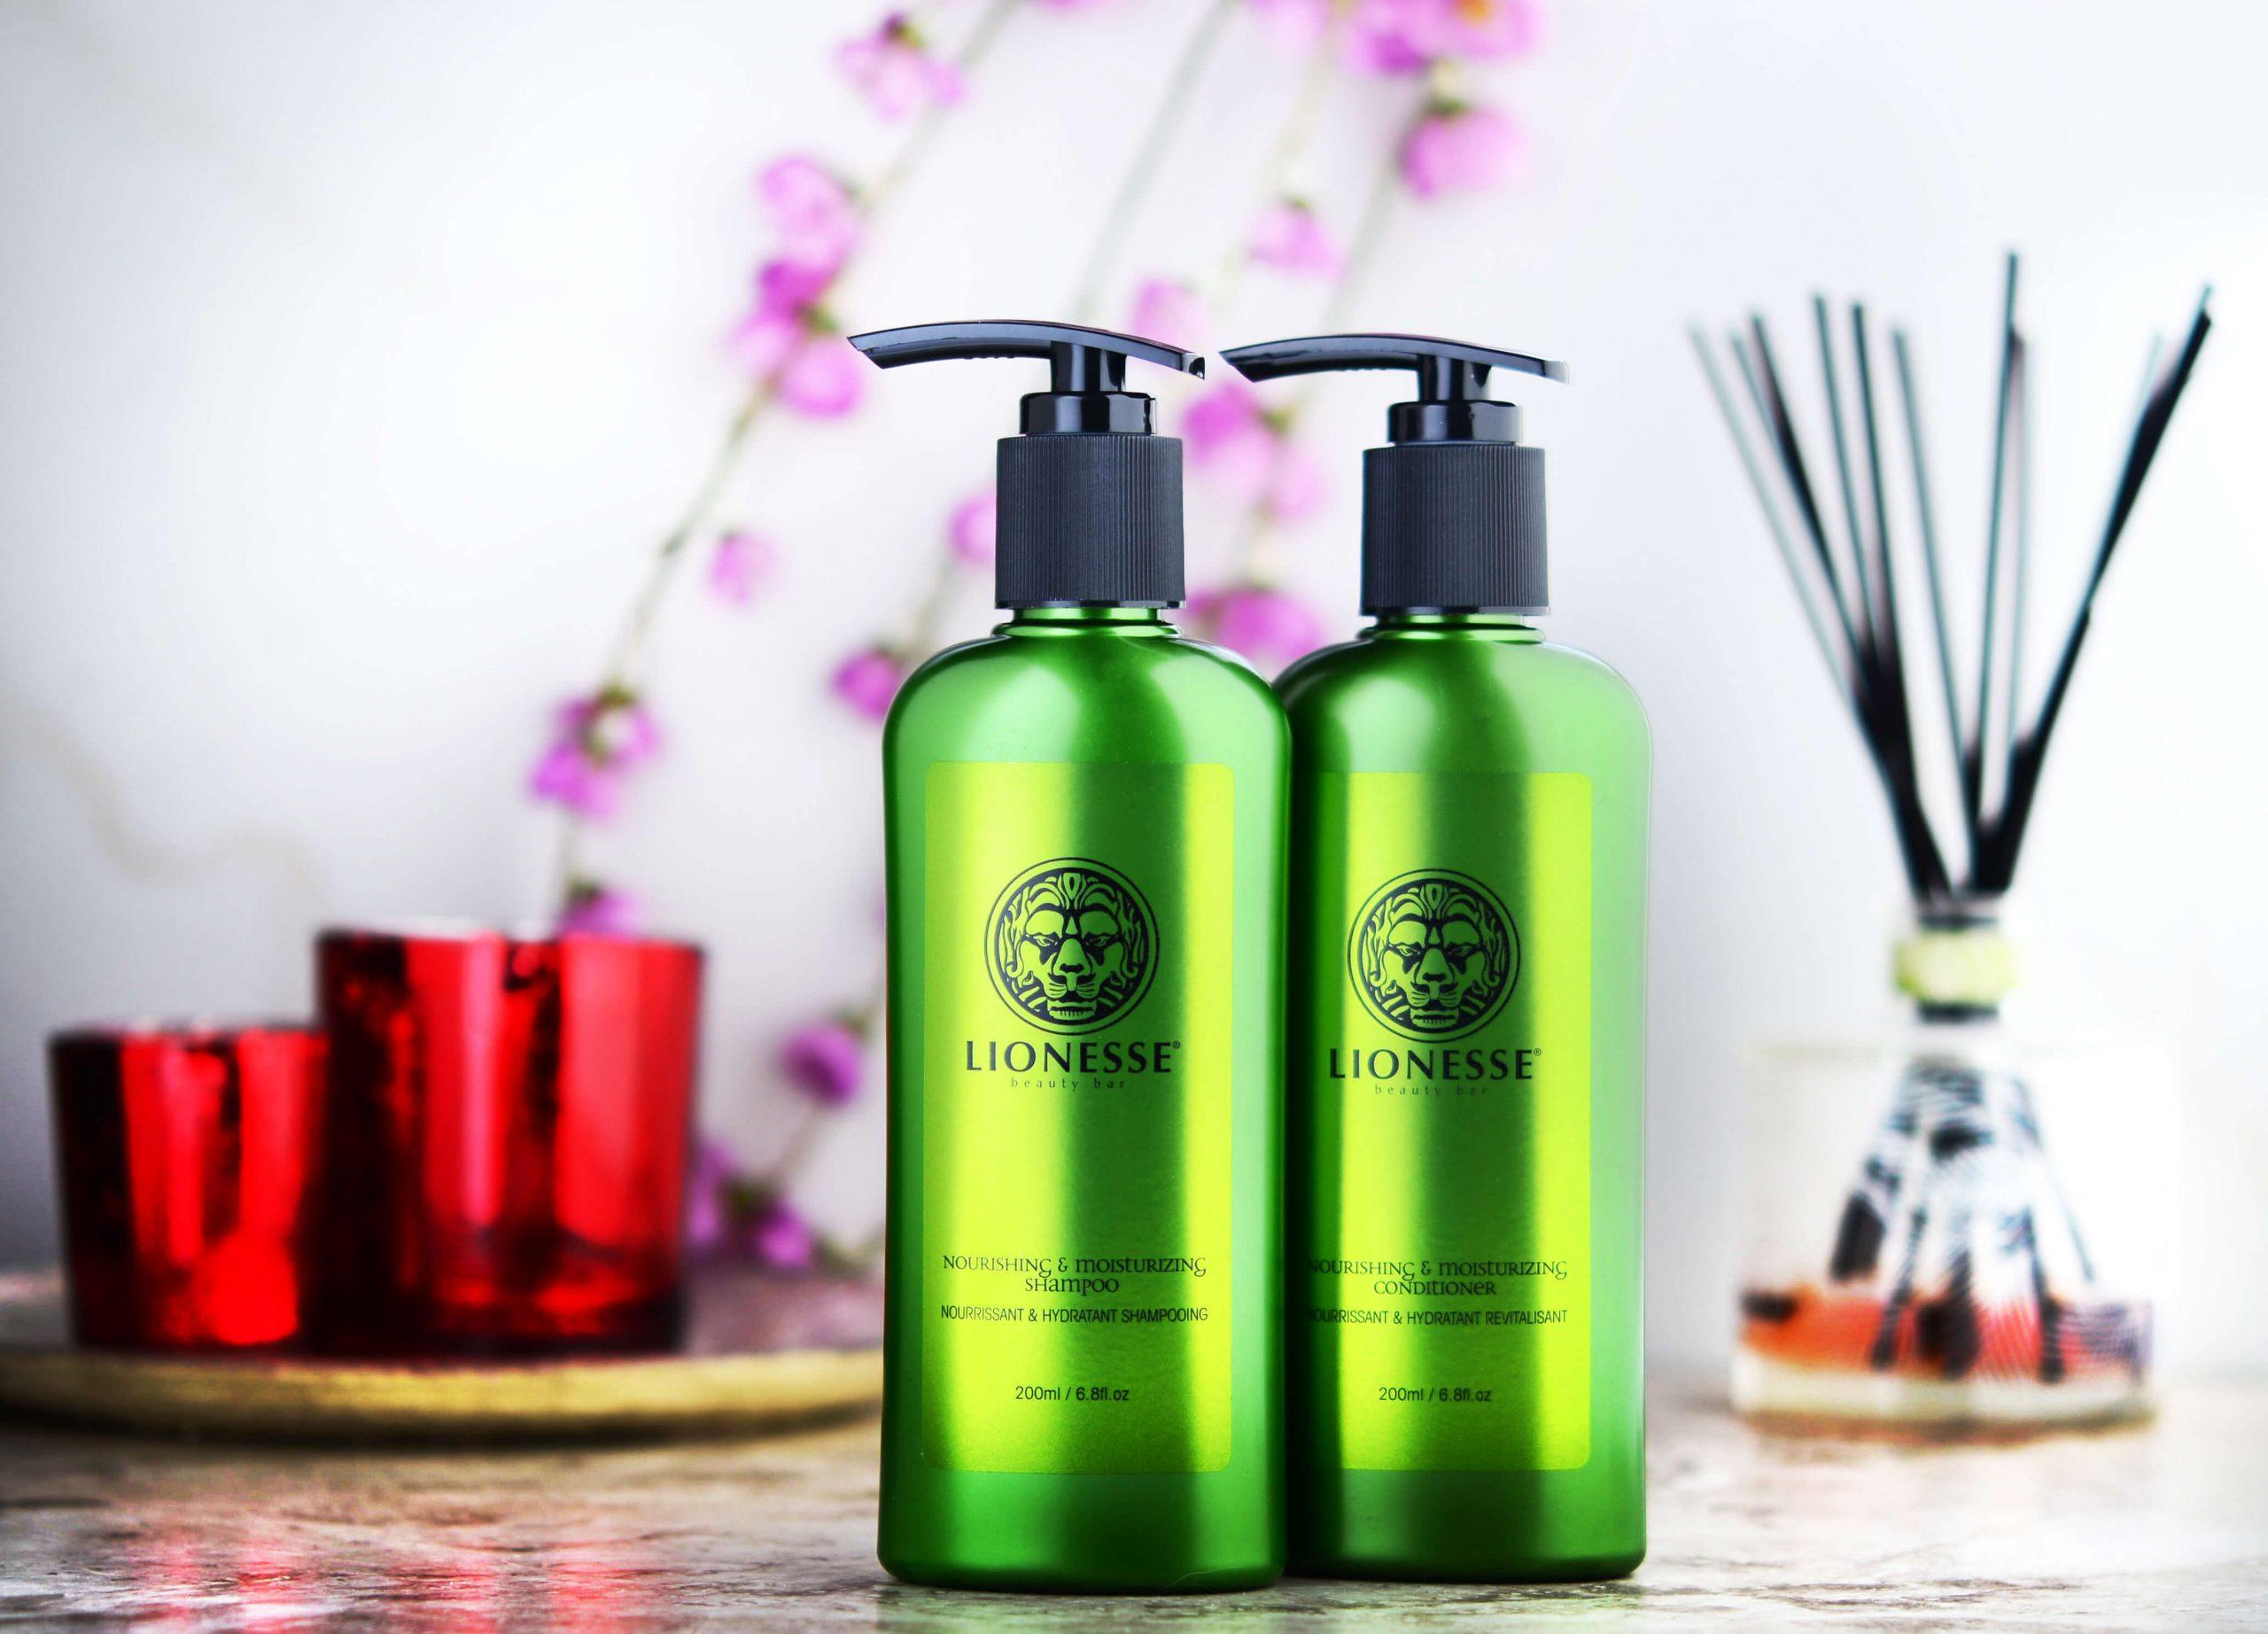 Lionesse shampoo and conditioner